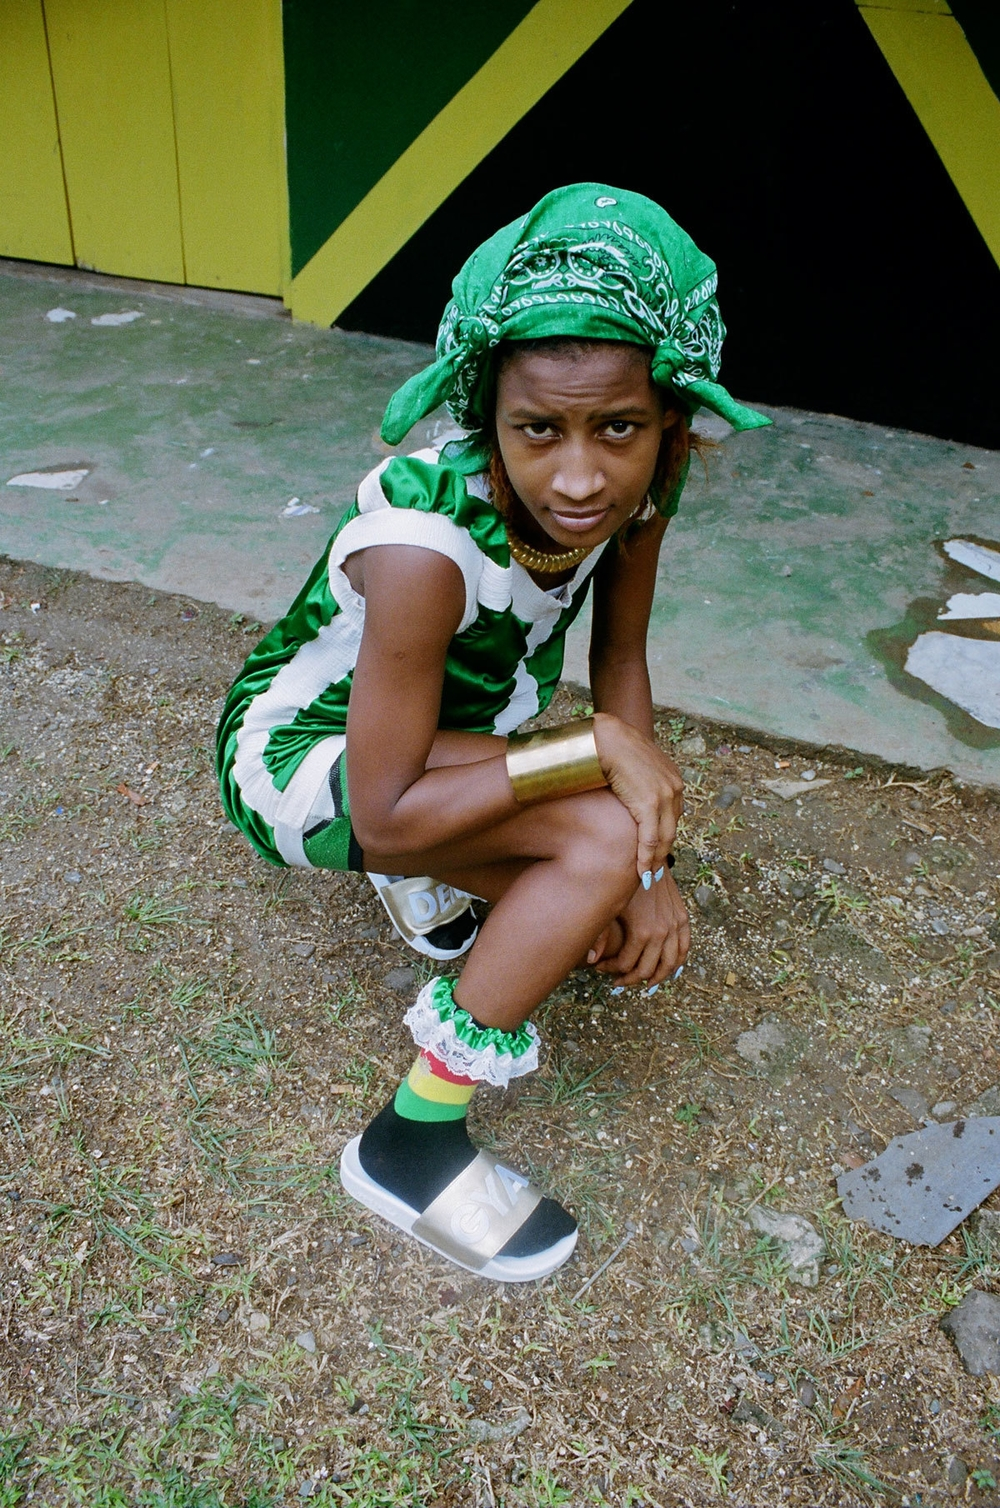 join-savannah-bakers-adidas-gyal-dem-body-image-1441376028.jpg